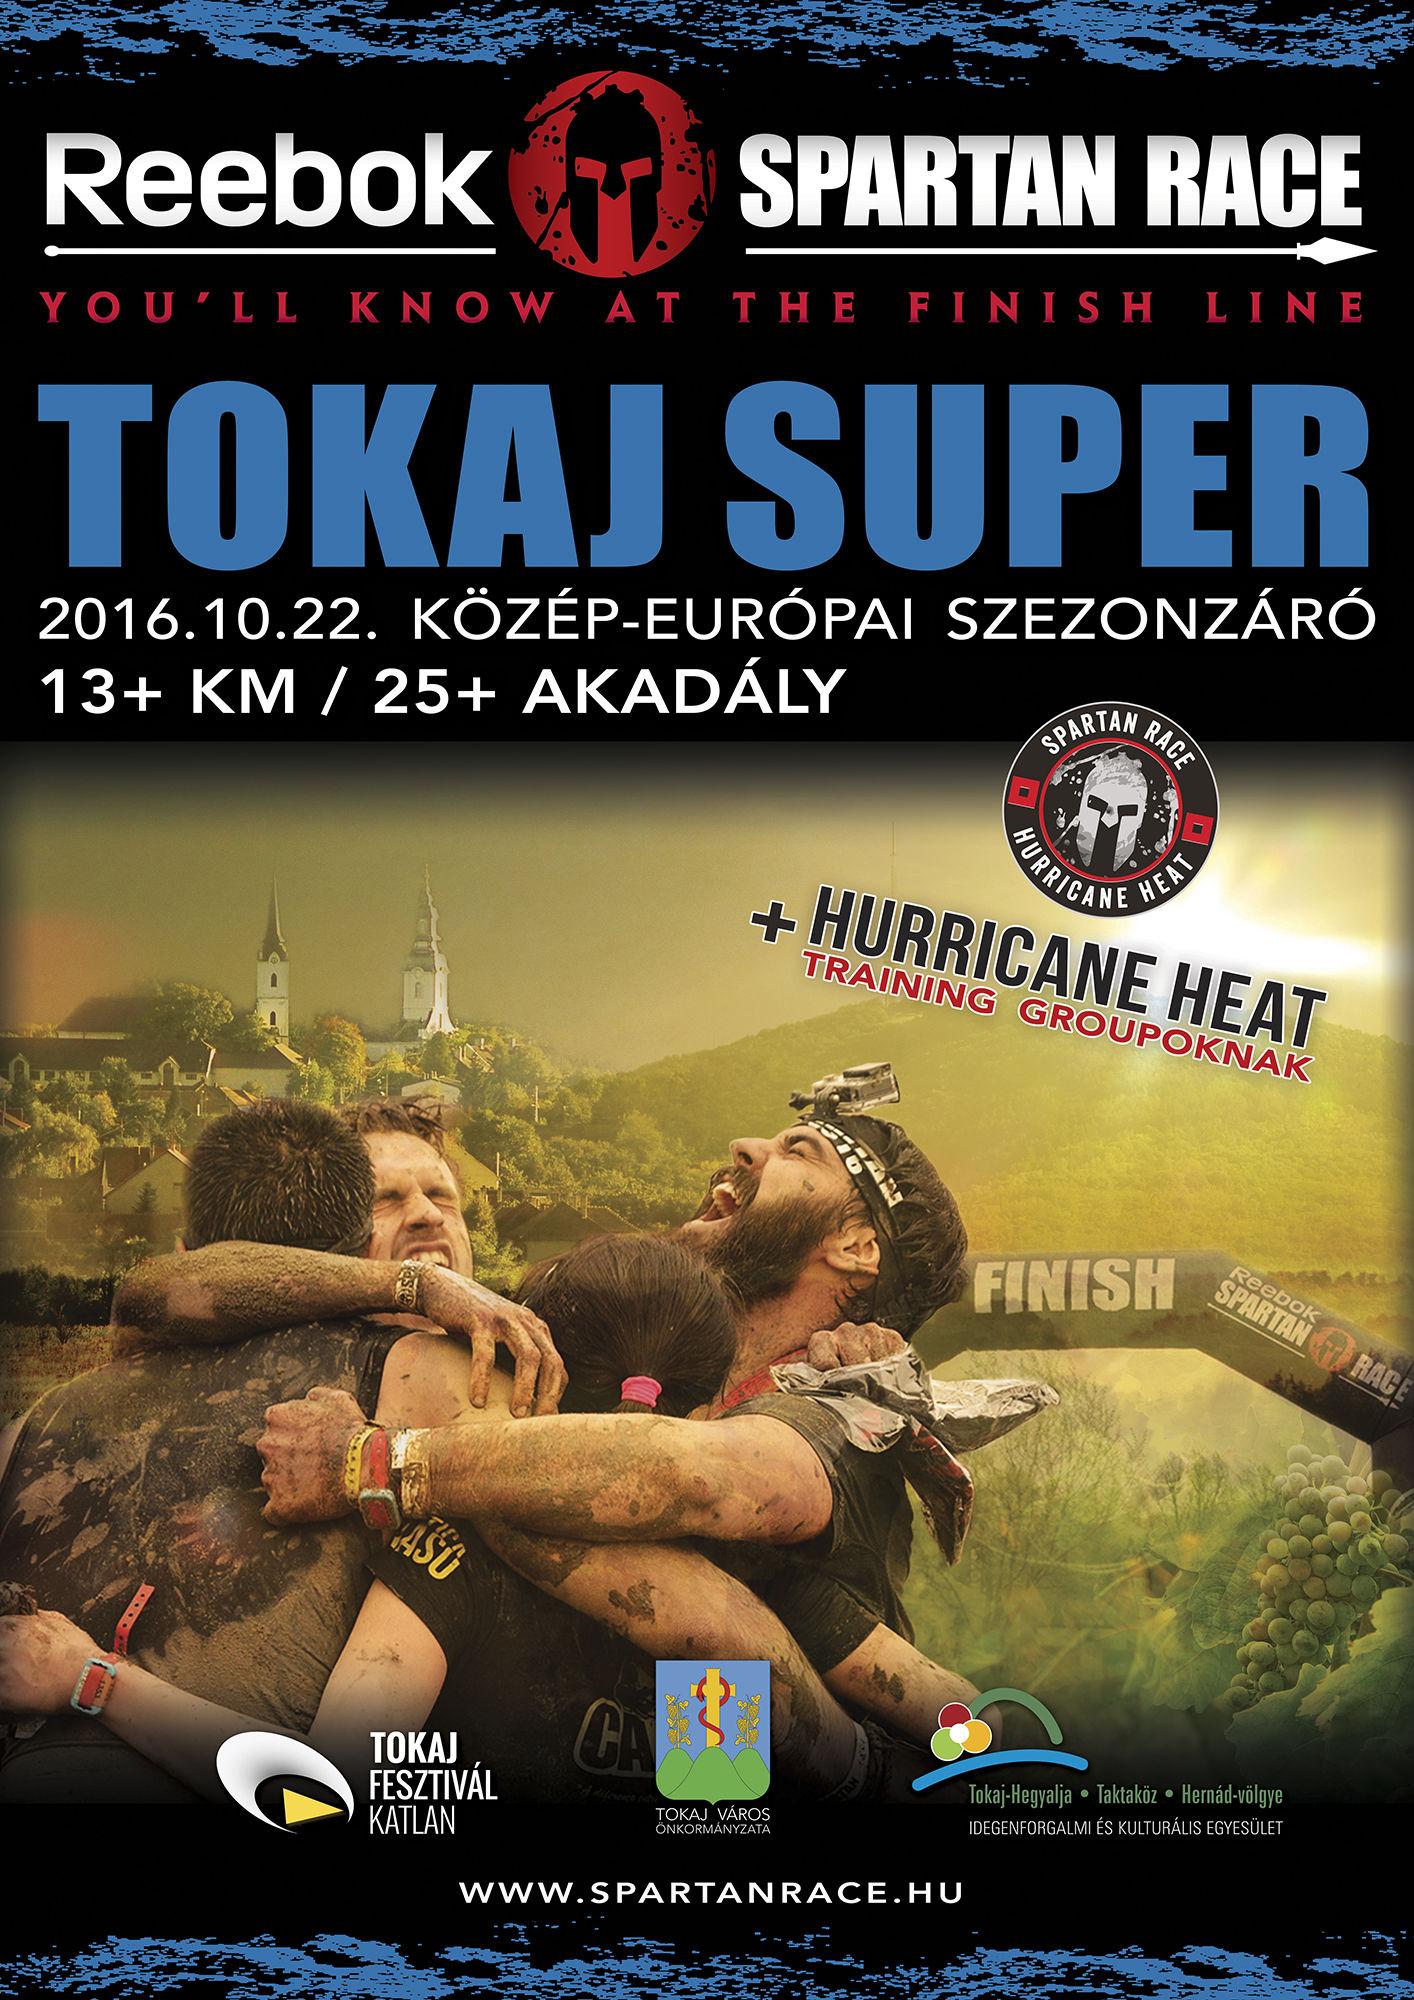 Tokaj_2016_Poster_adult_final_web.jpg